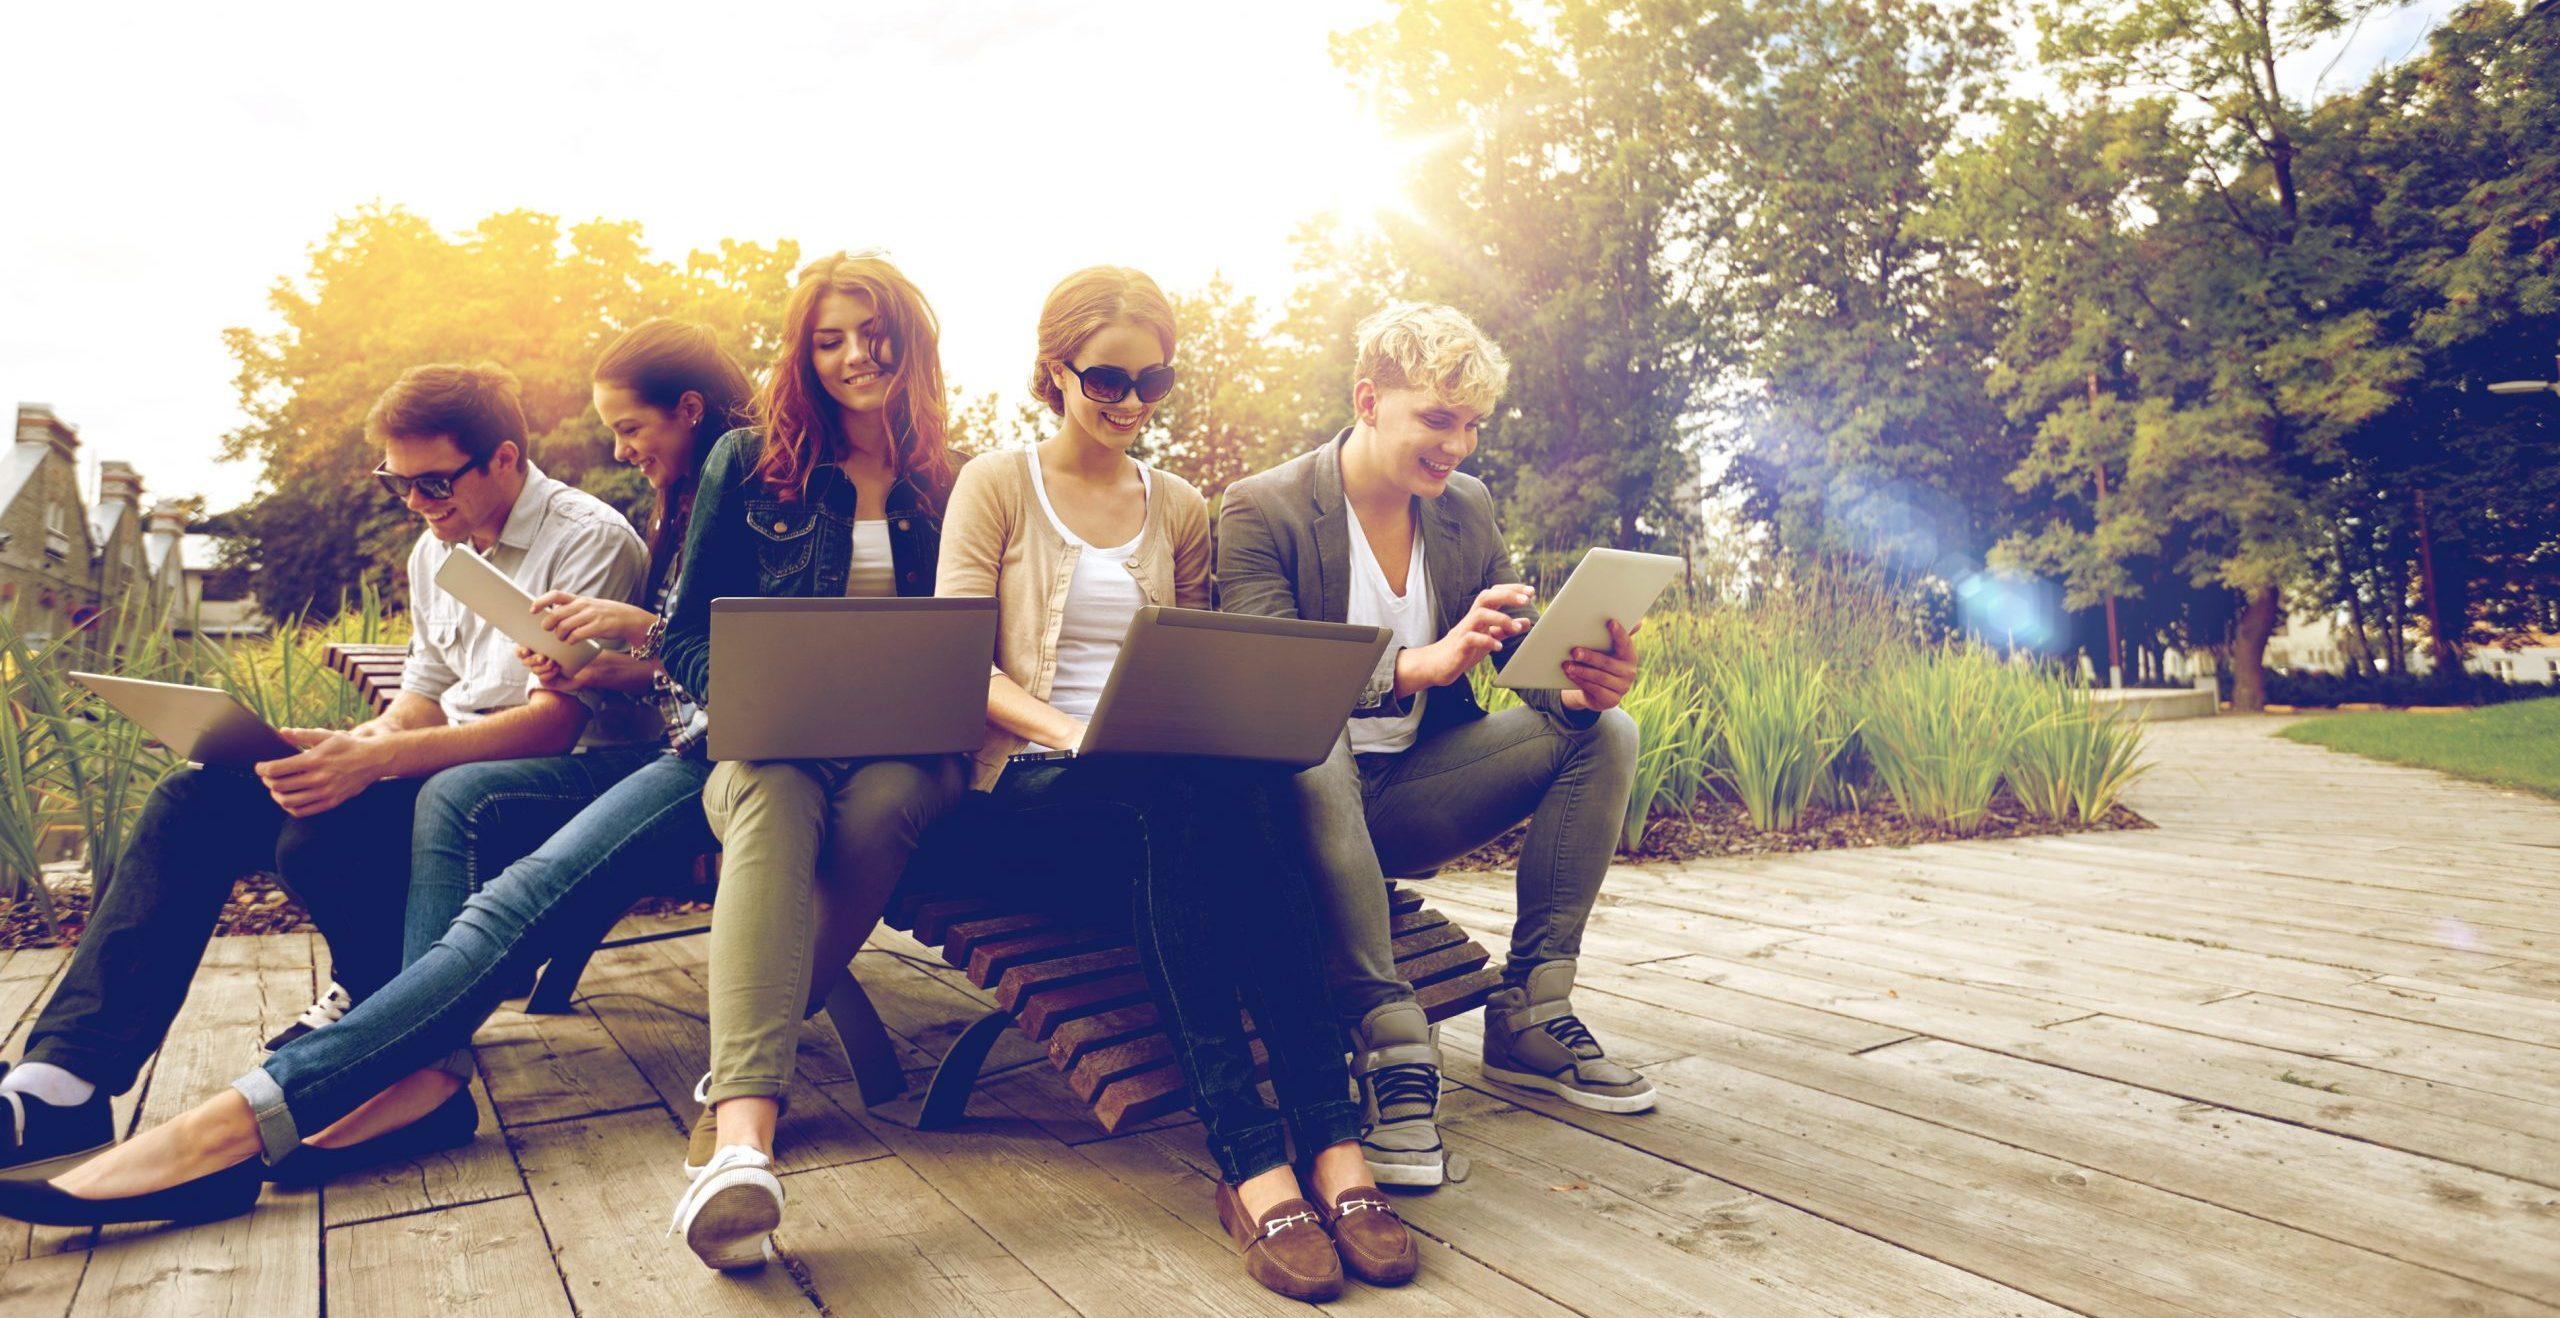 Studierende mit Laptops